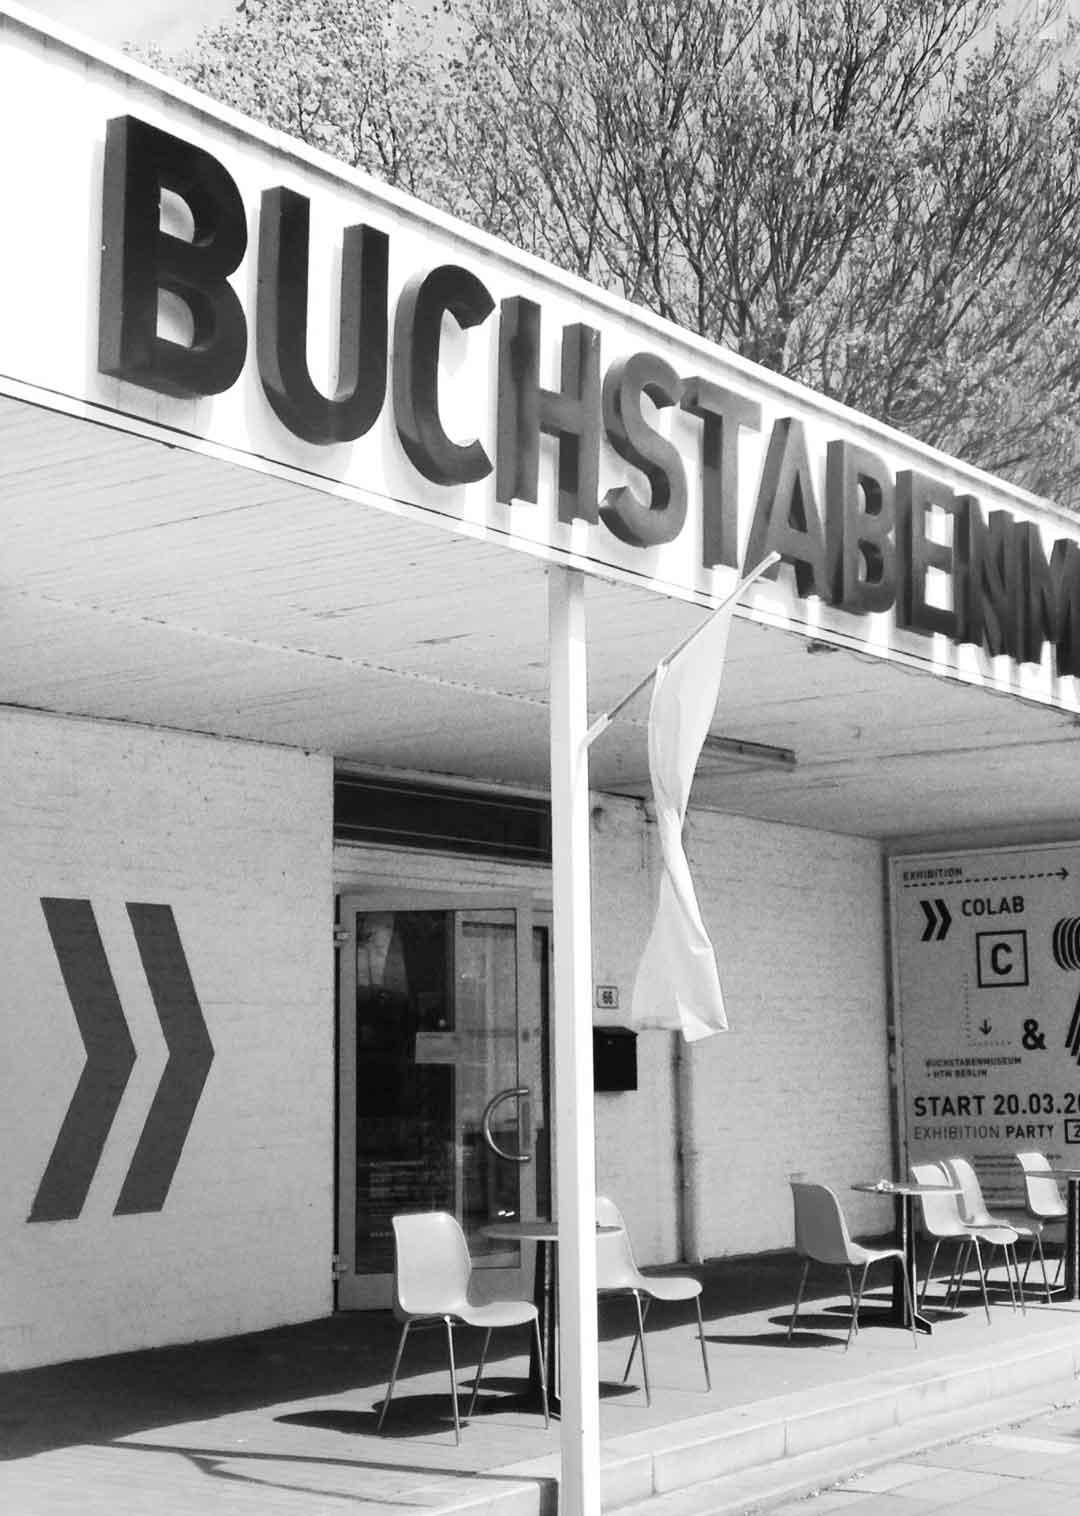 Buchstabenmuseum-image